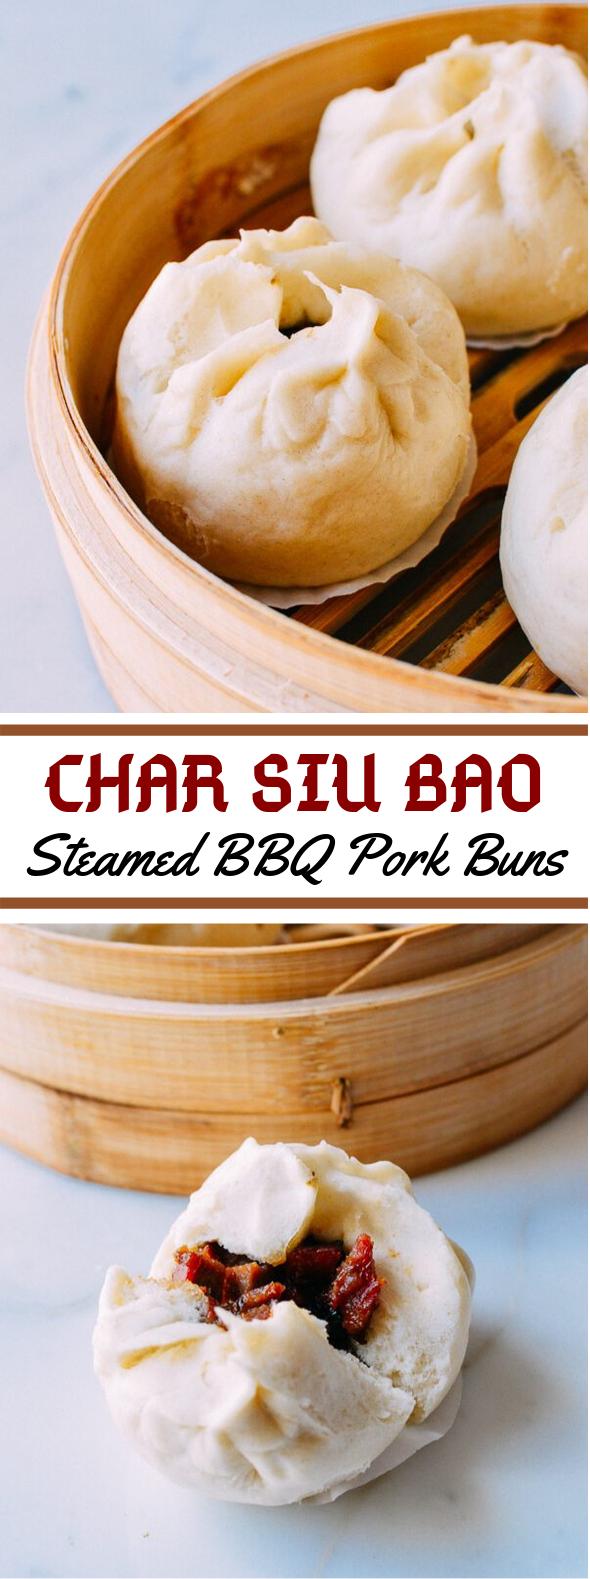 STEAMED BBQ PORK BUNS (CHAR SIU BAO) RECIPE #dinner #comfortfood